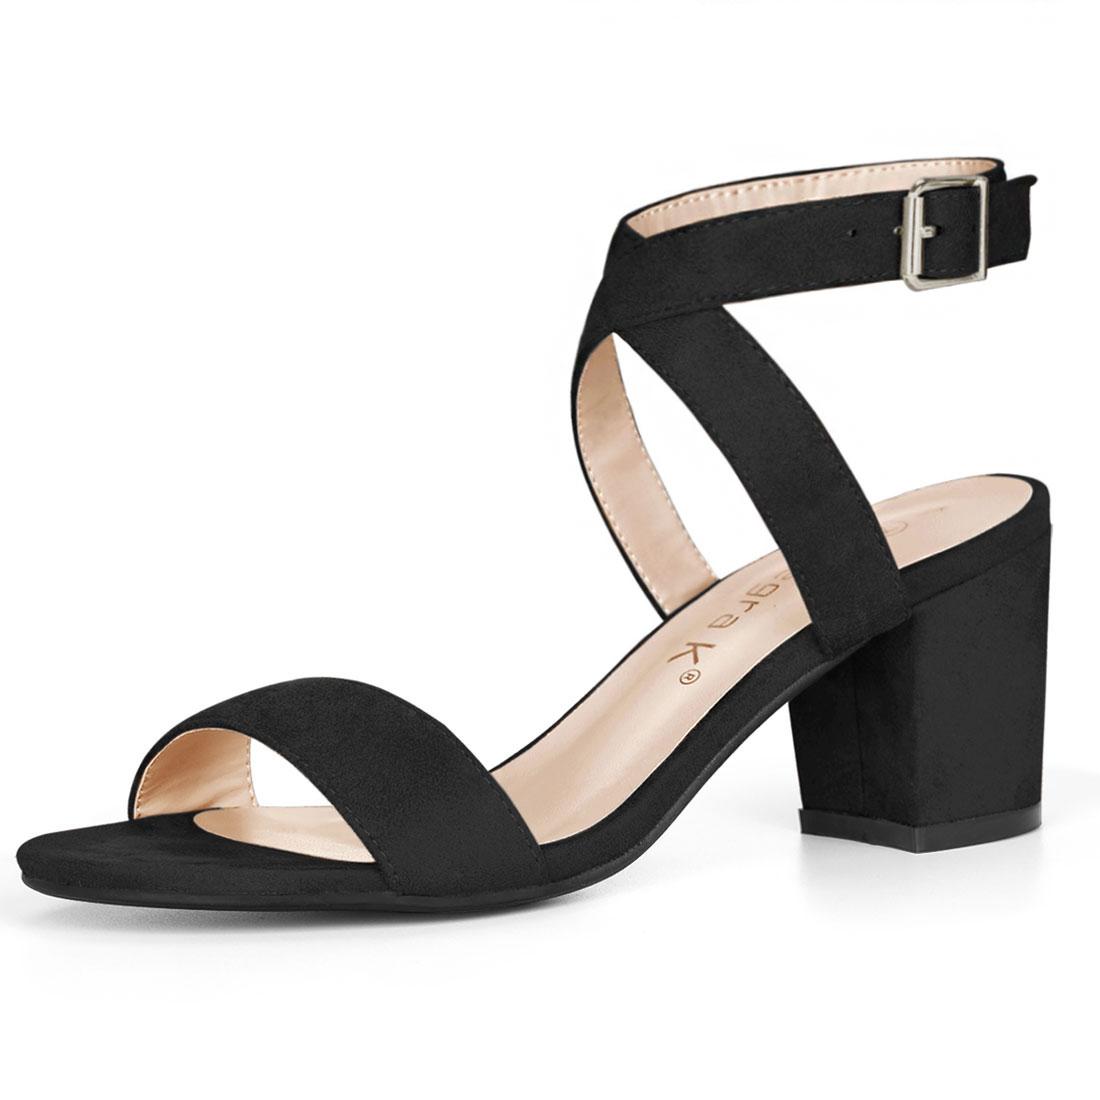 Allegra K Women's Crisscross Mid Block Heel Ankle Strap Sandals Black US 6